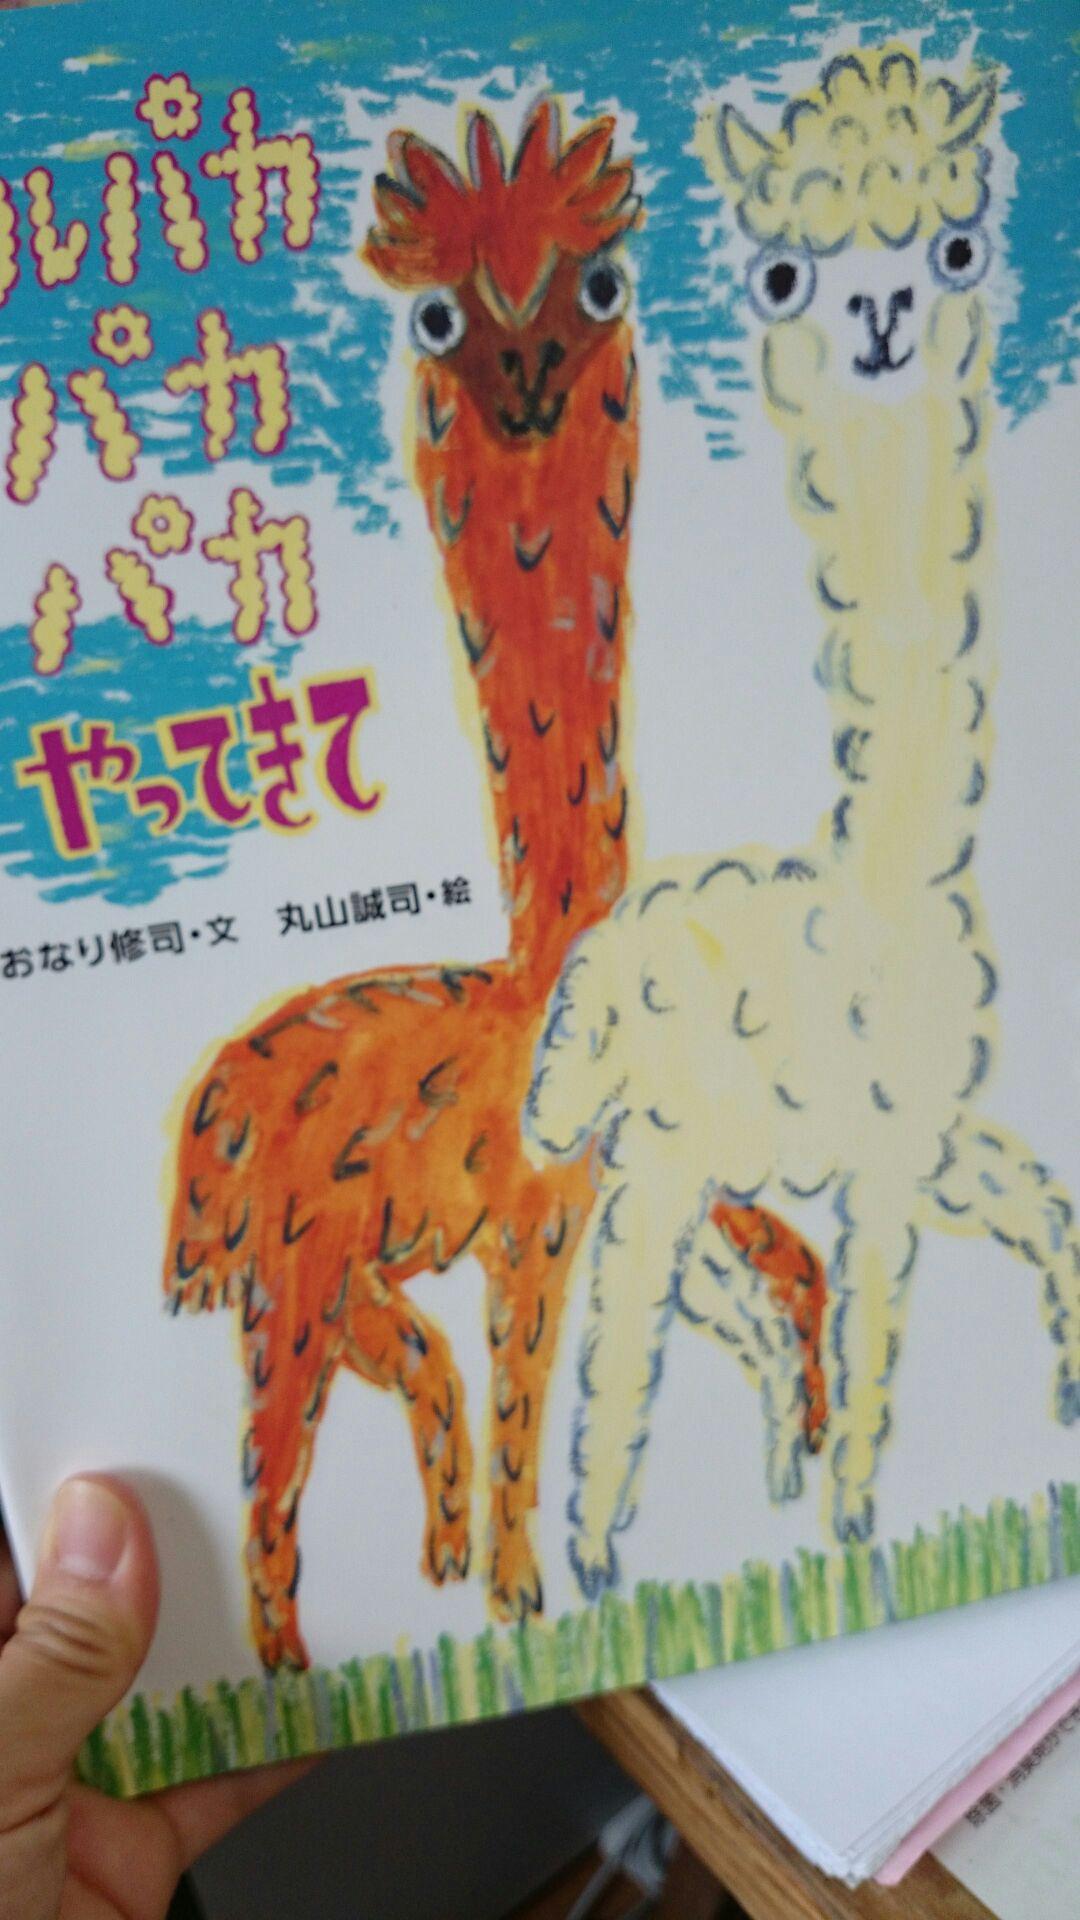 第一回 絵本祭り_d0180229_16483924.jpg